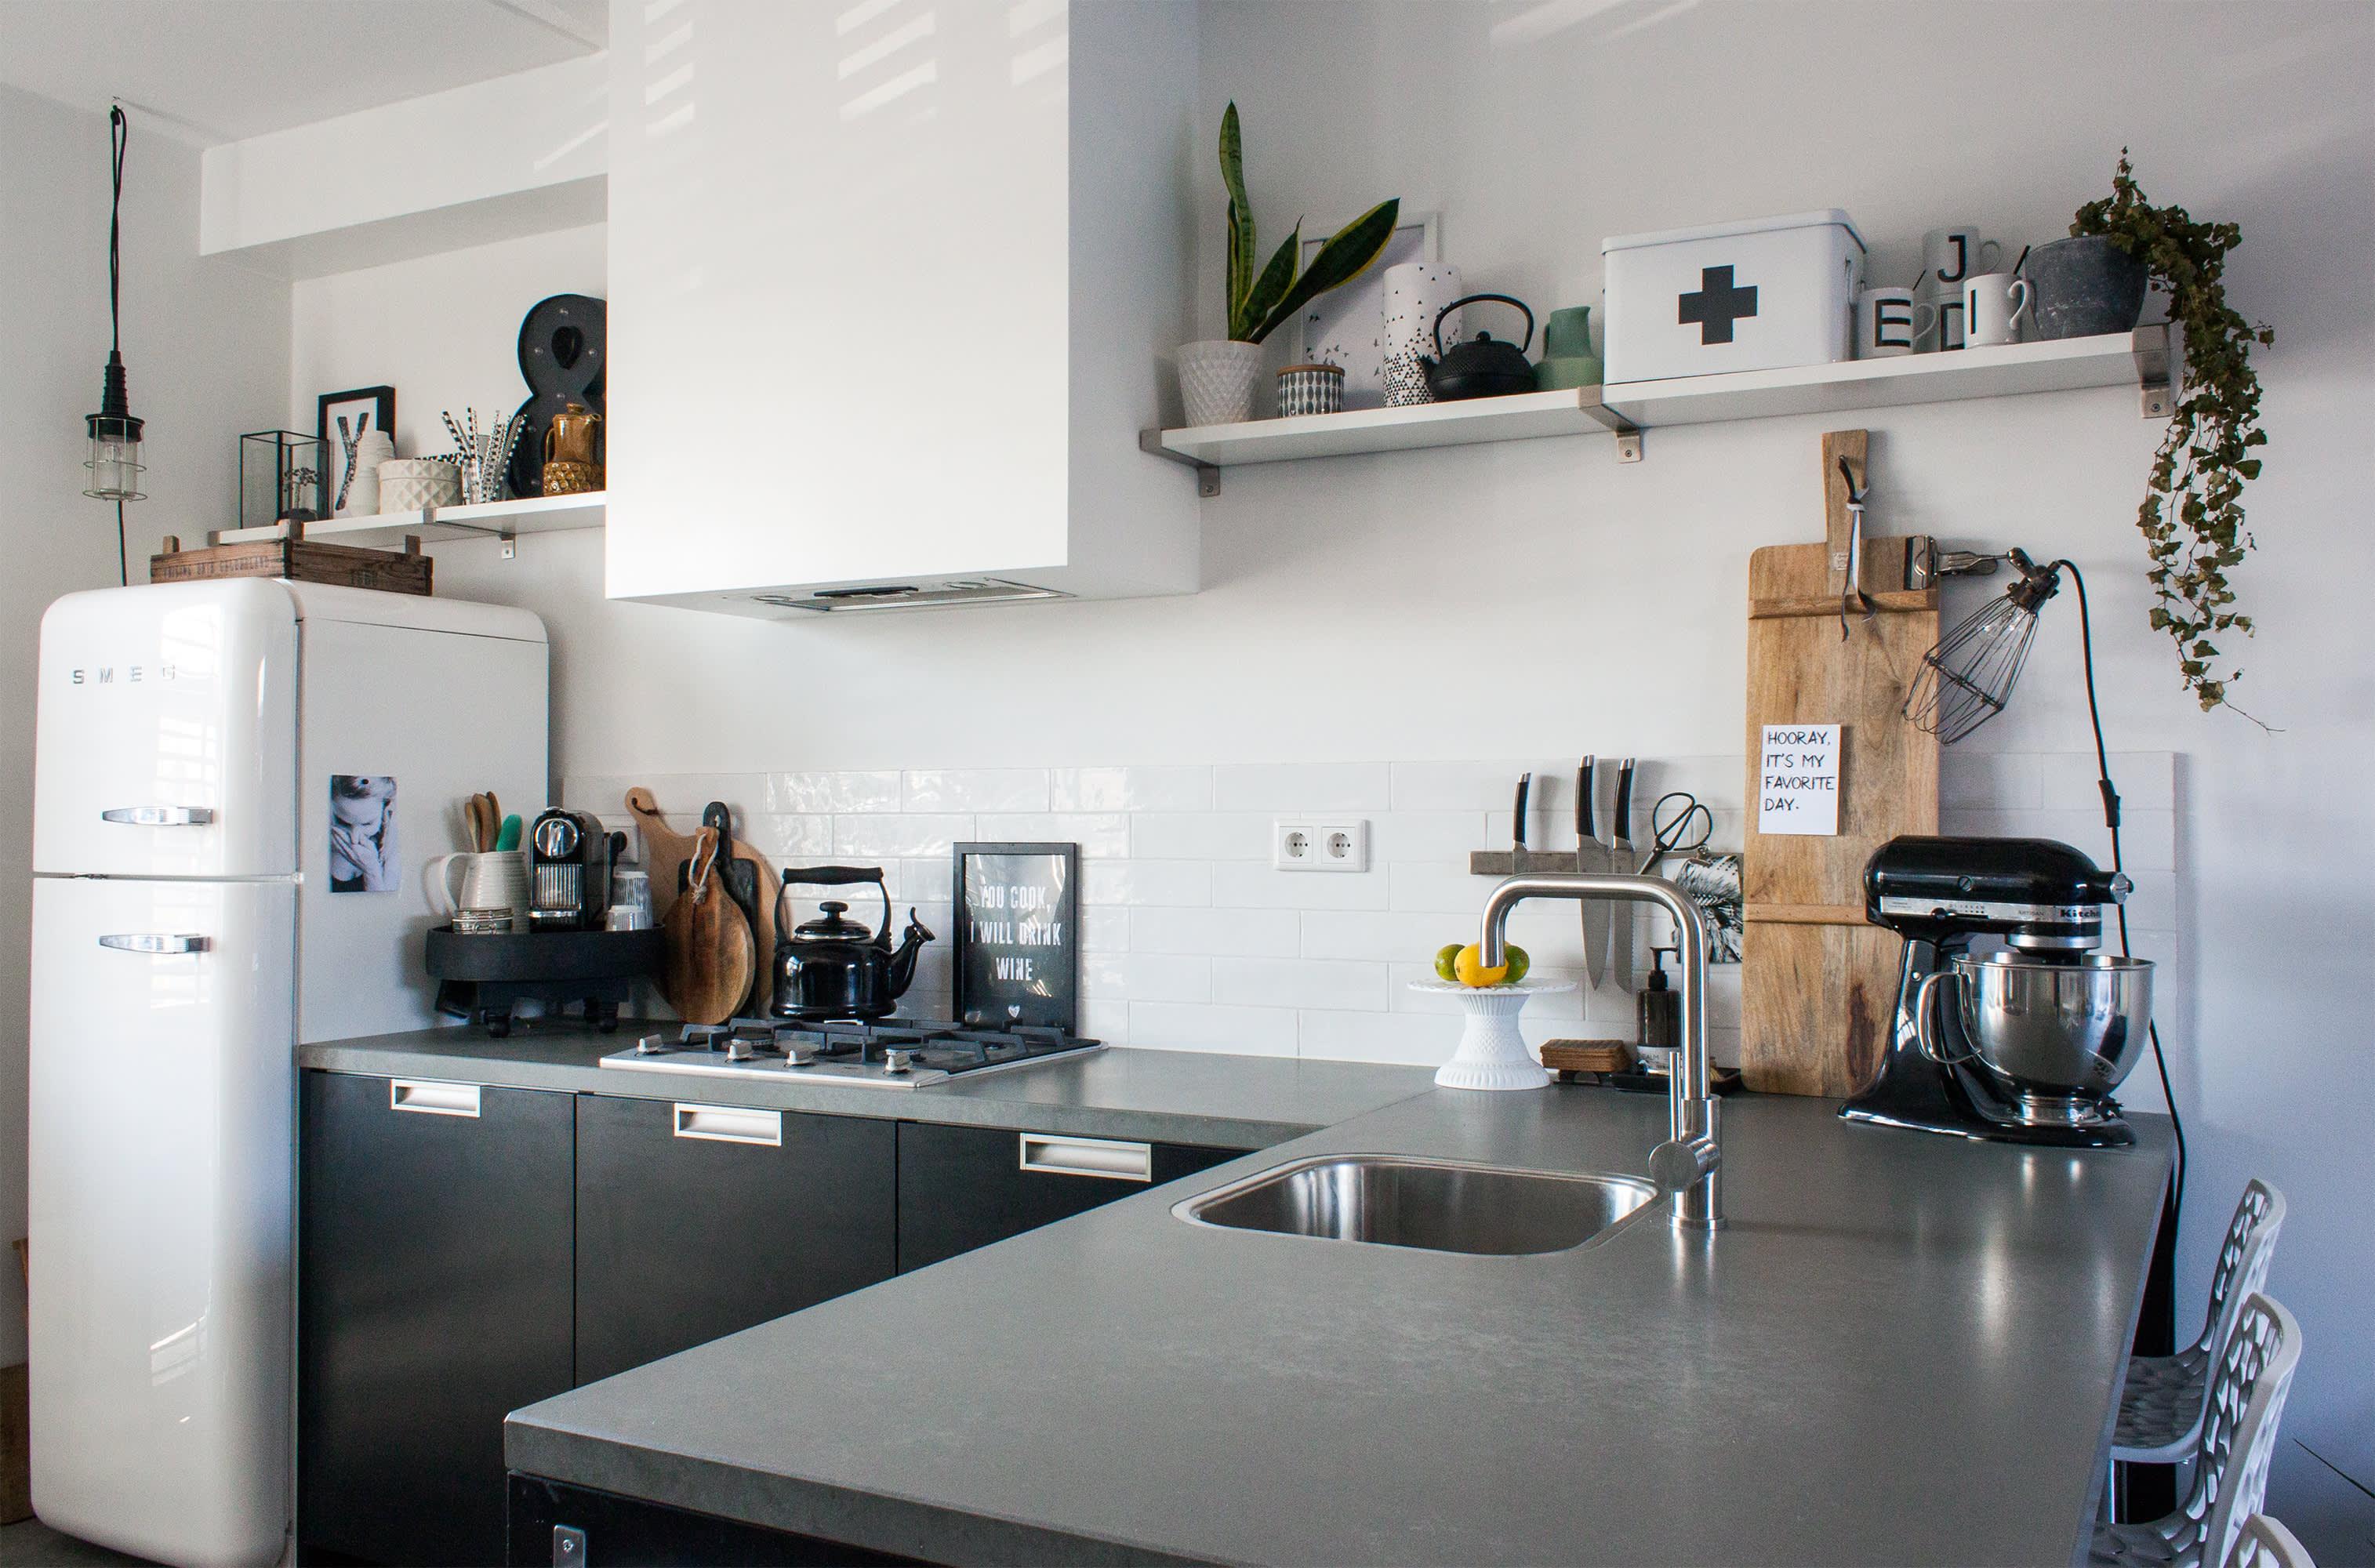 Smeg Appliances In Stylish Kitchens Apartment Therapy